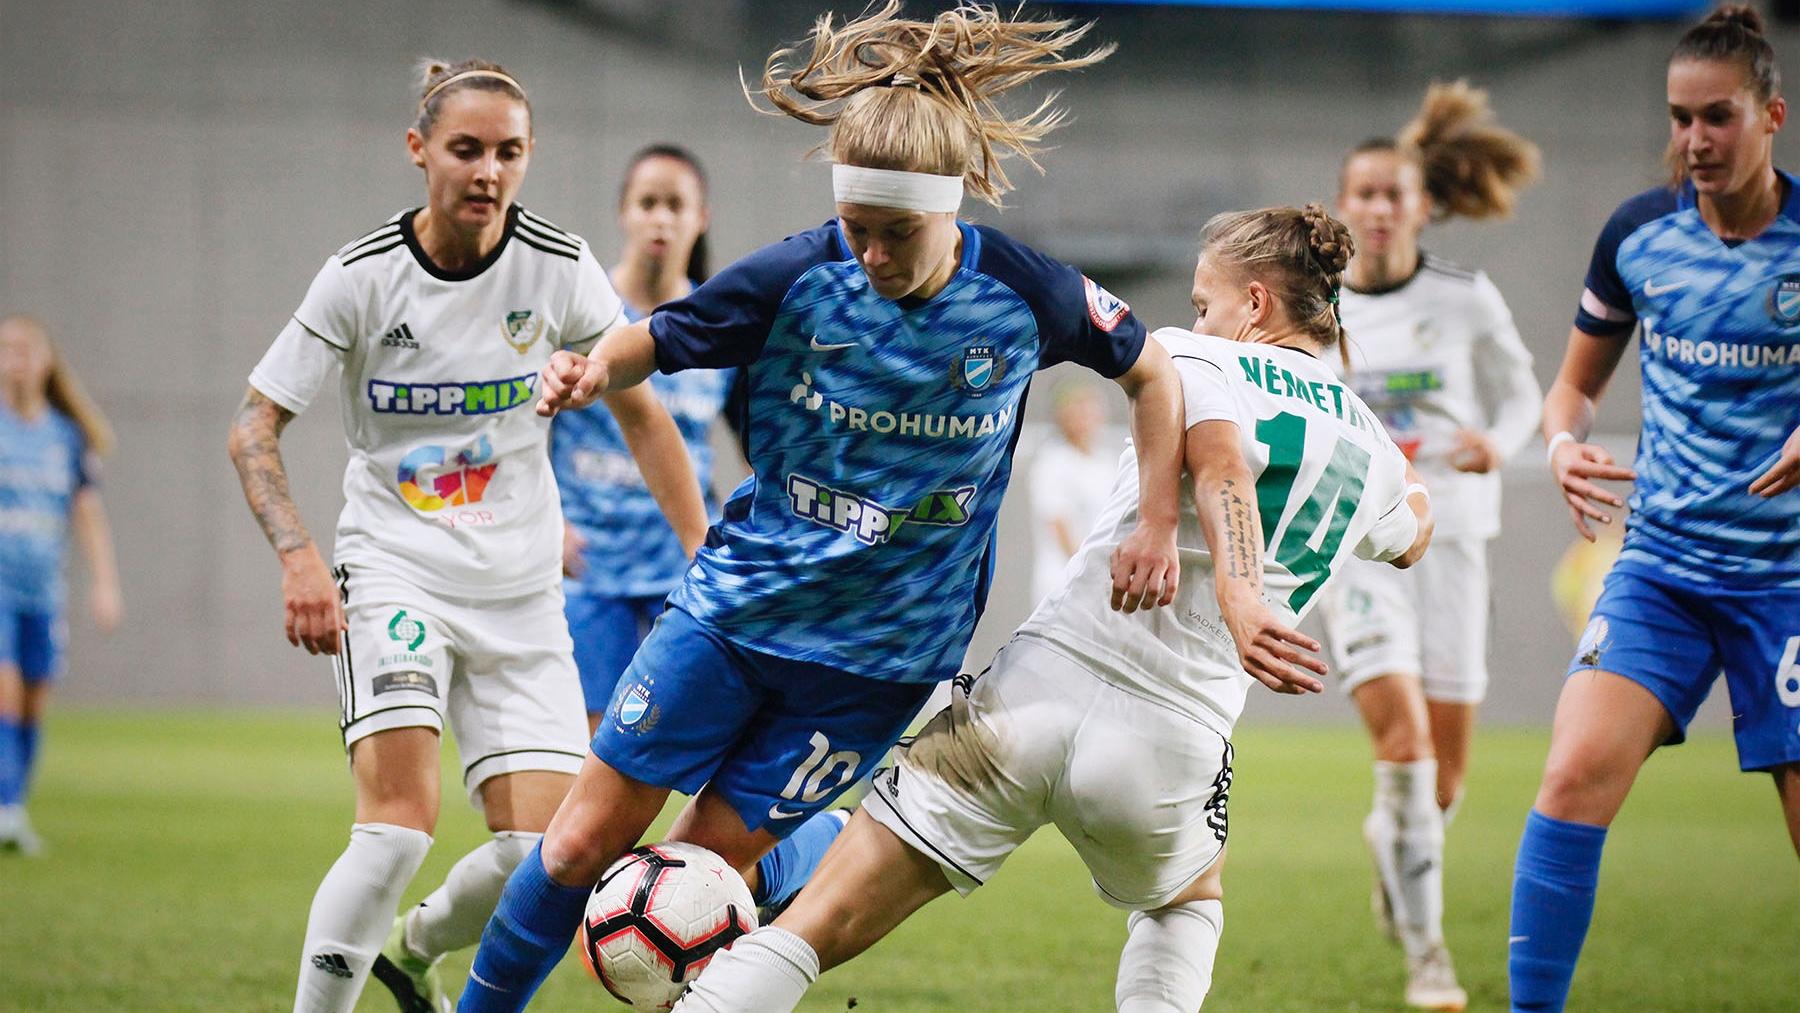 Képgaléria: MTK Budapest - ETO FC Győr 2-2